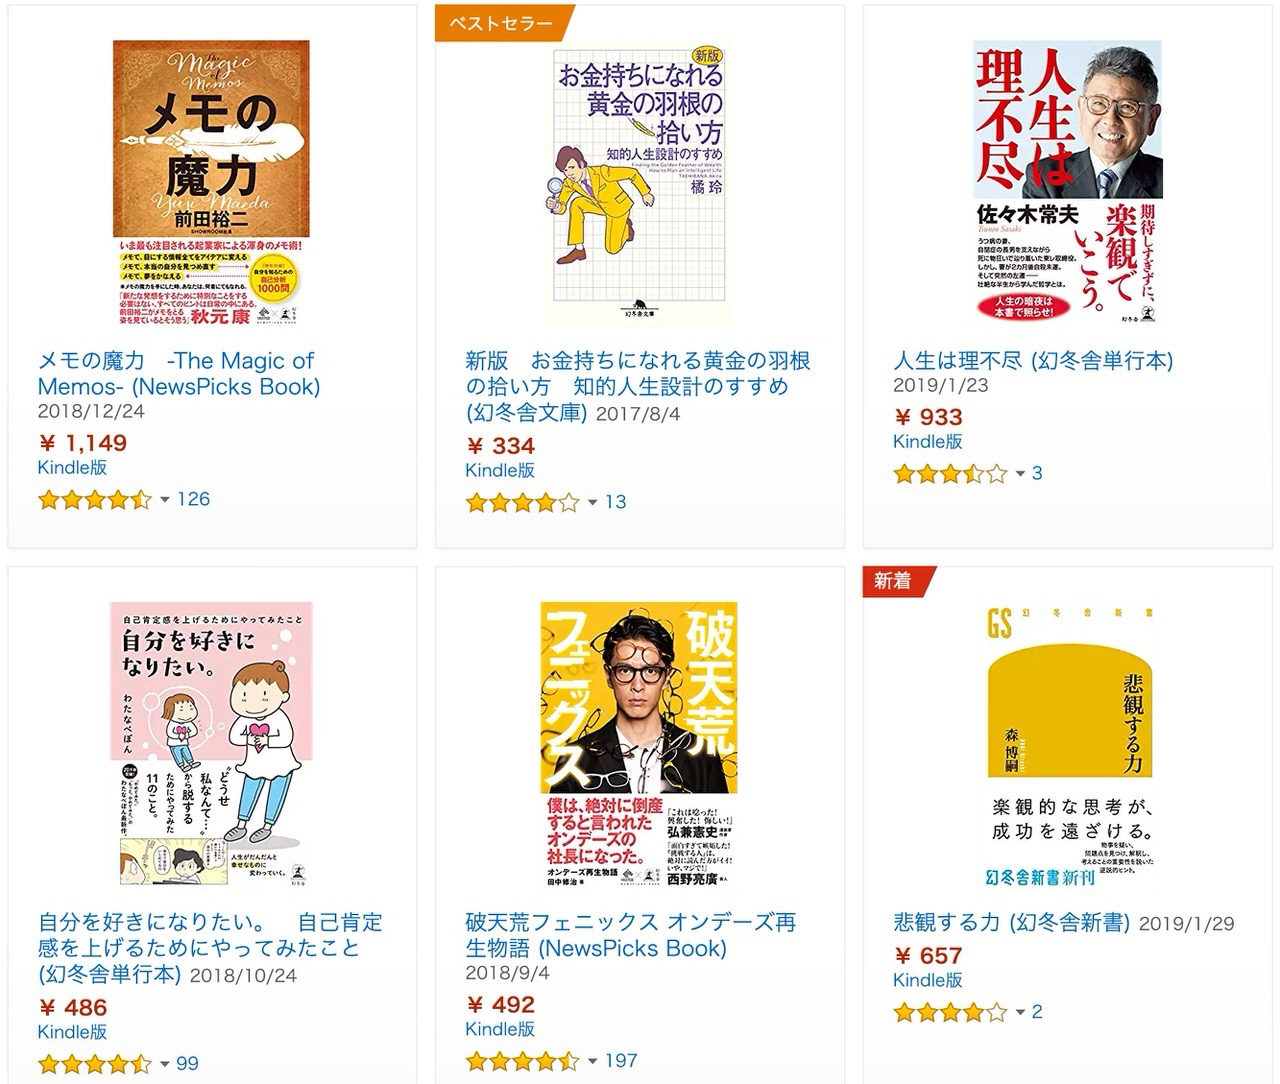 【Kindleセール】約3,700冊以上が対象!最大70%OFFキャンペーン「幻冬舎 電本フェス」(2/21まで)